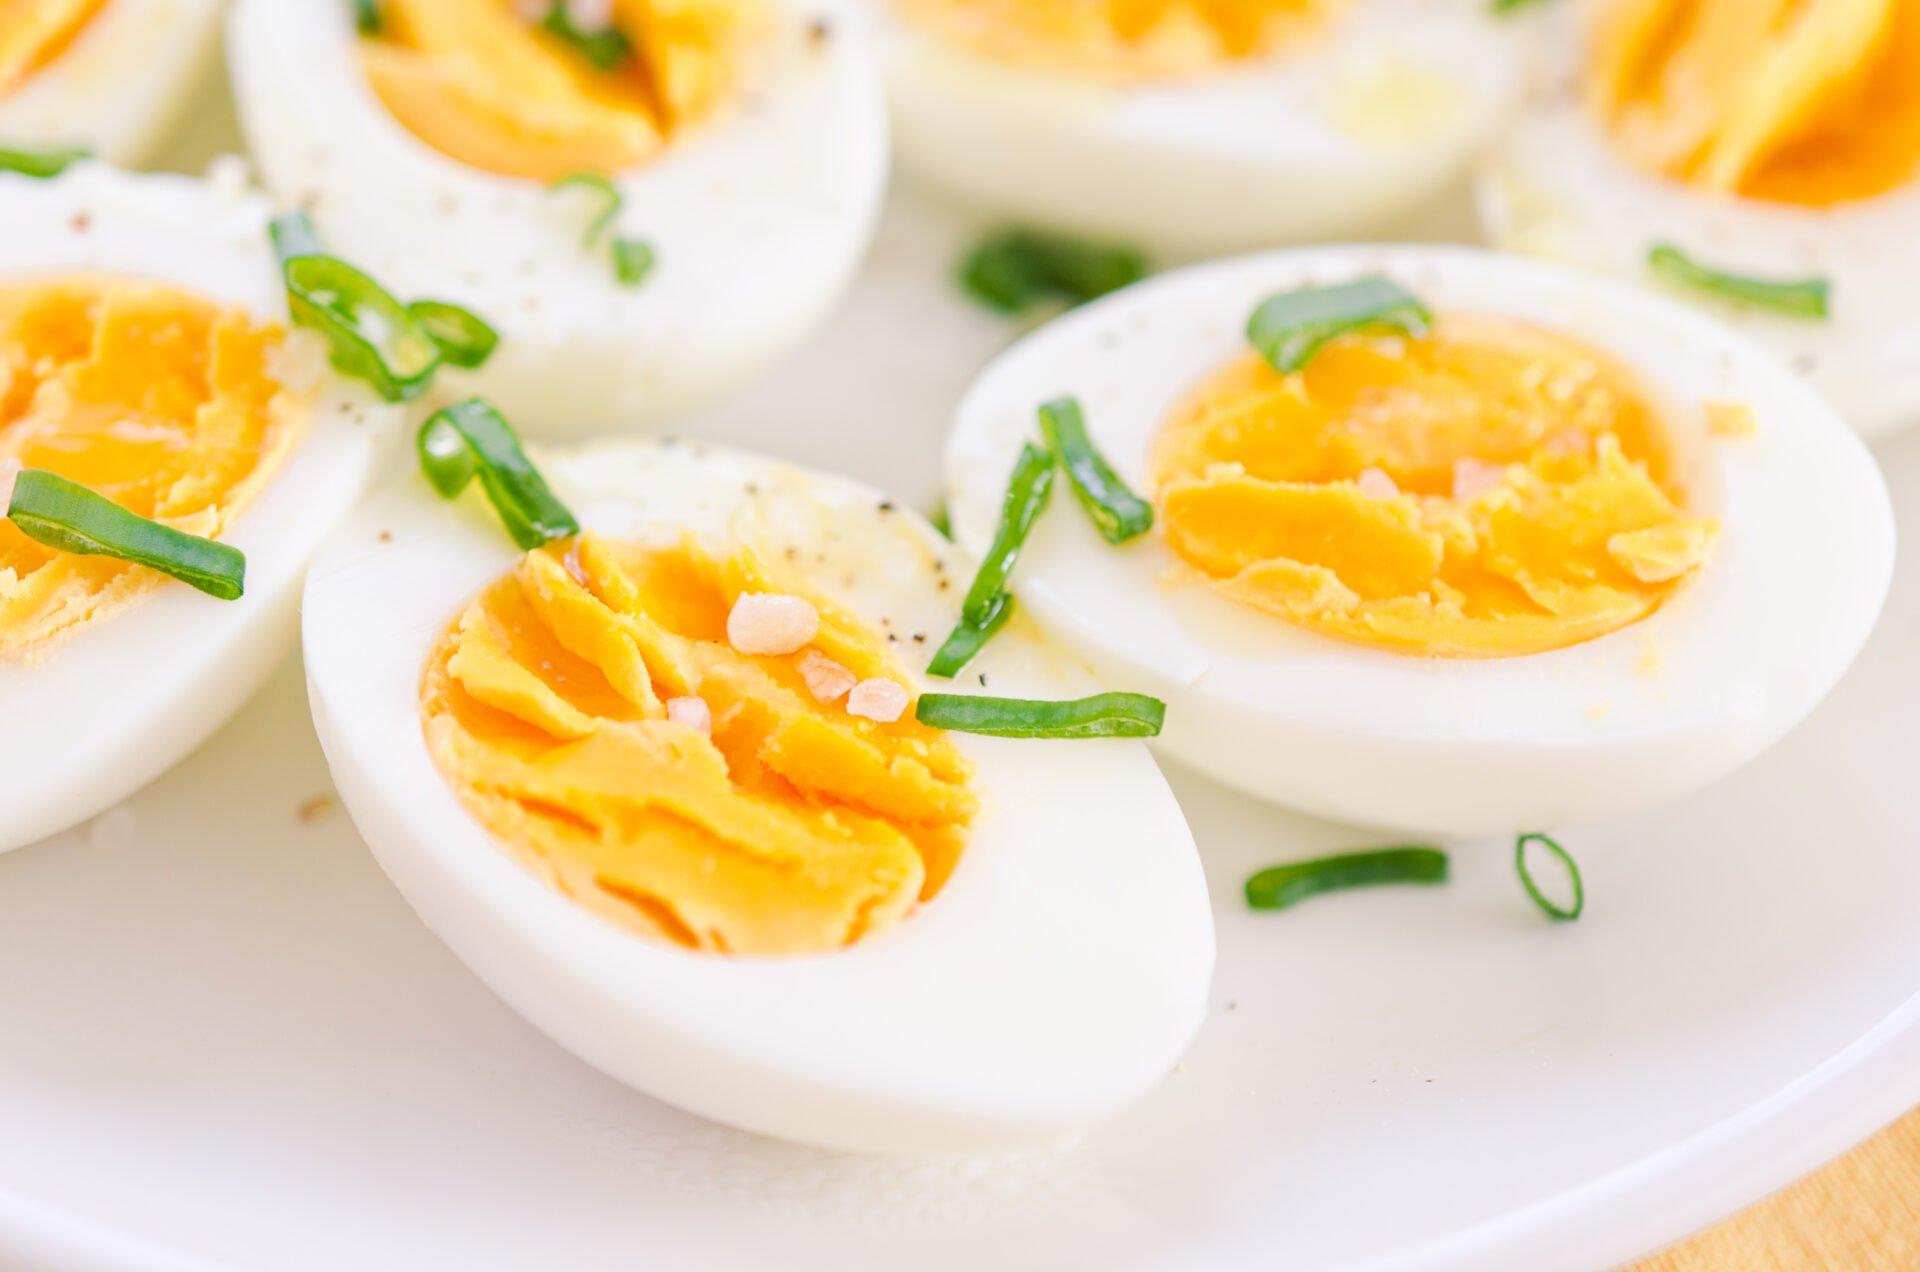 organic deviled eggs on plate